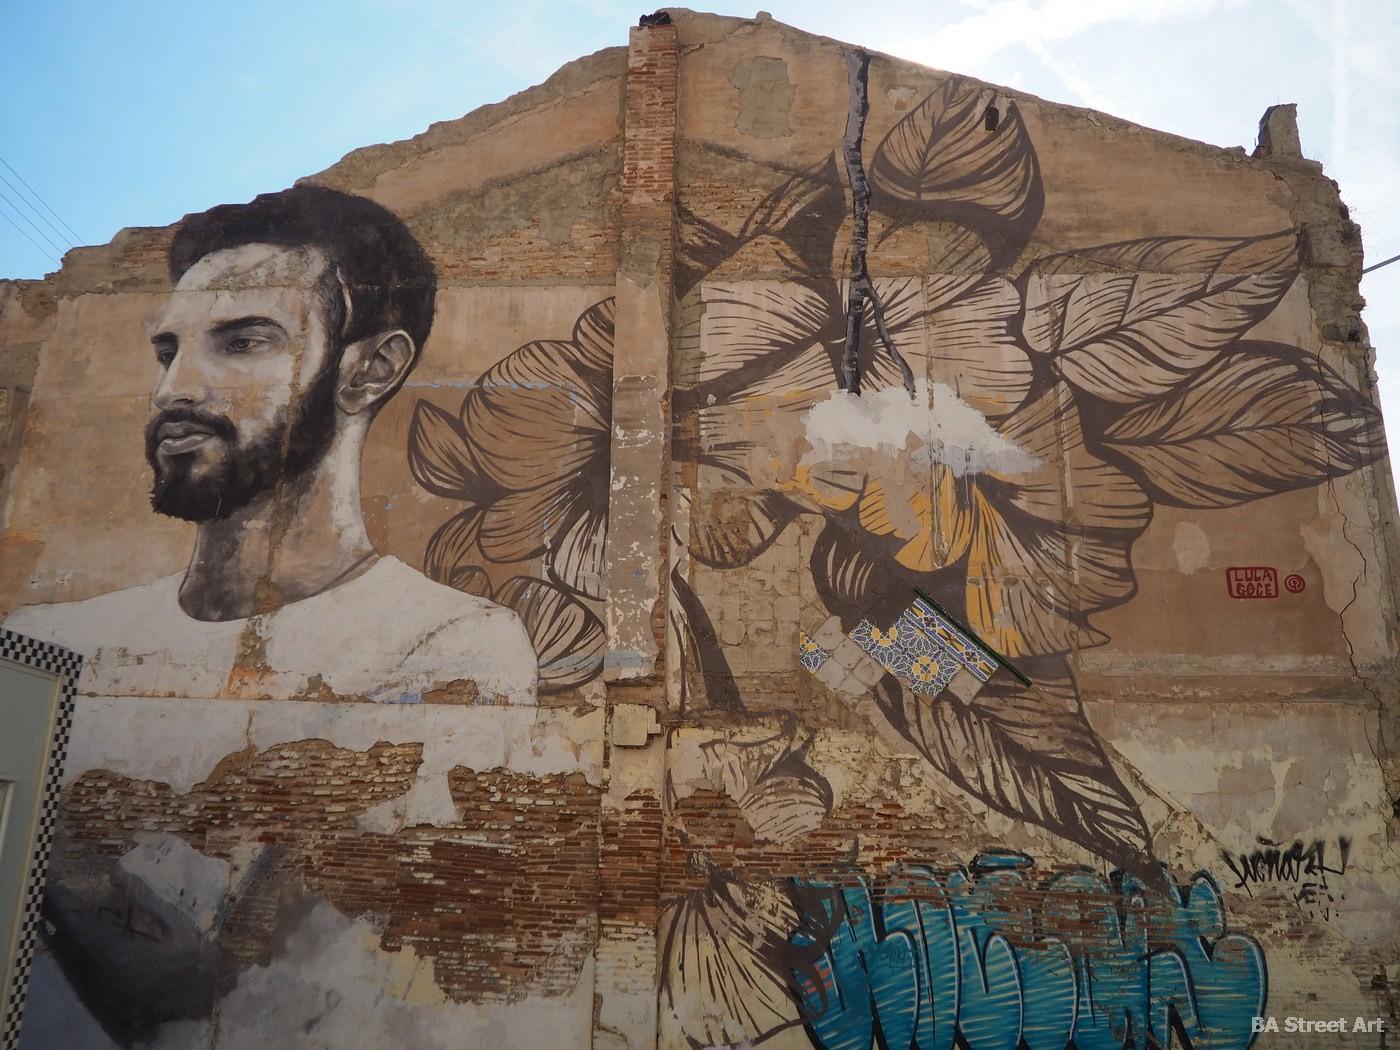 lula goce artista española barcelona mural en Valencia cabanyal buenosairesstreetart.co